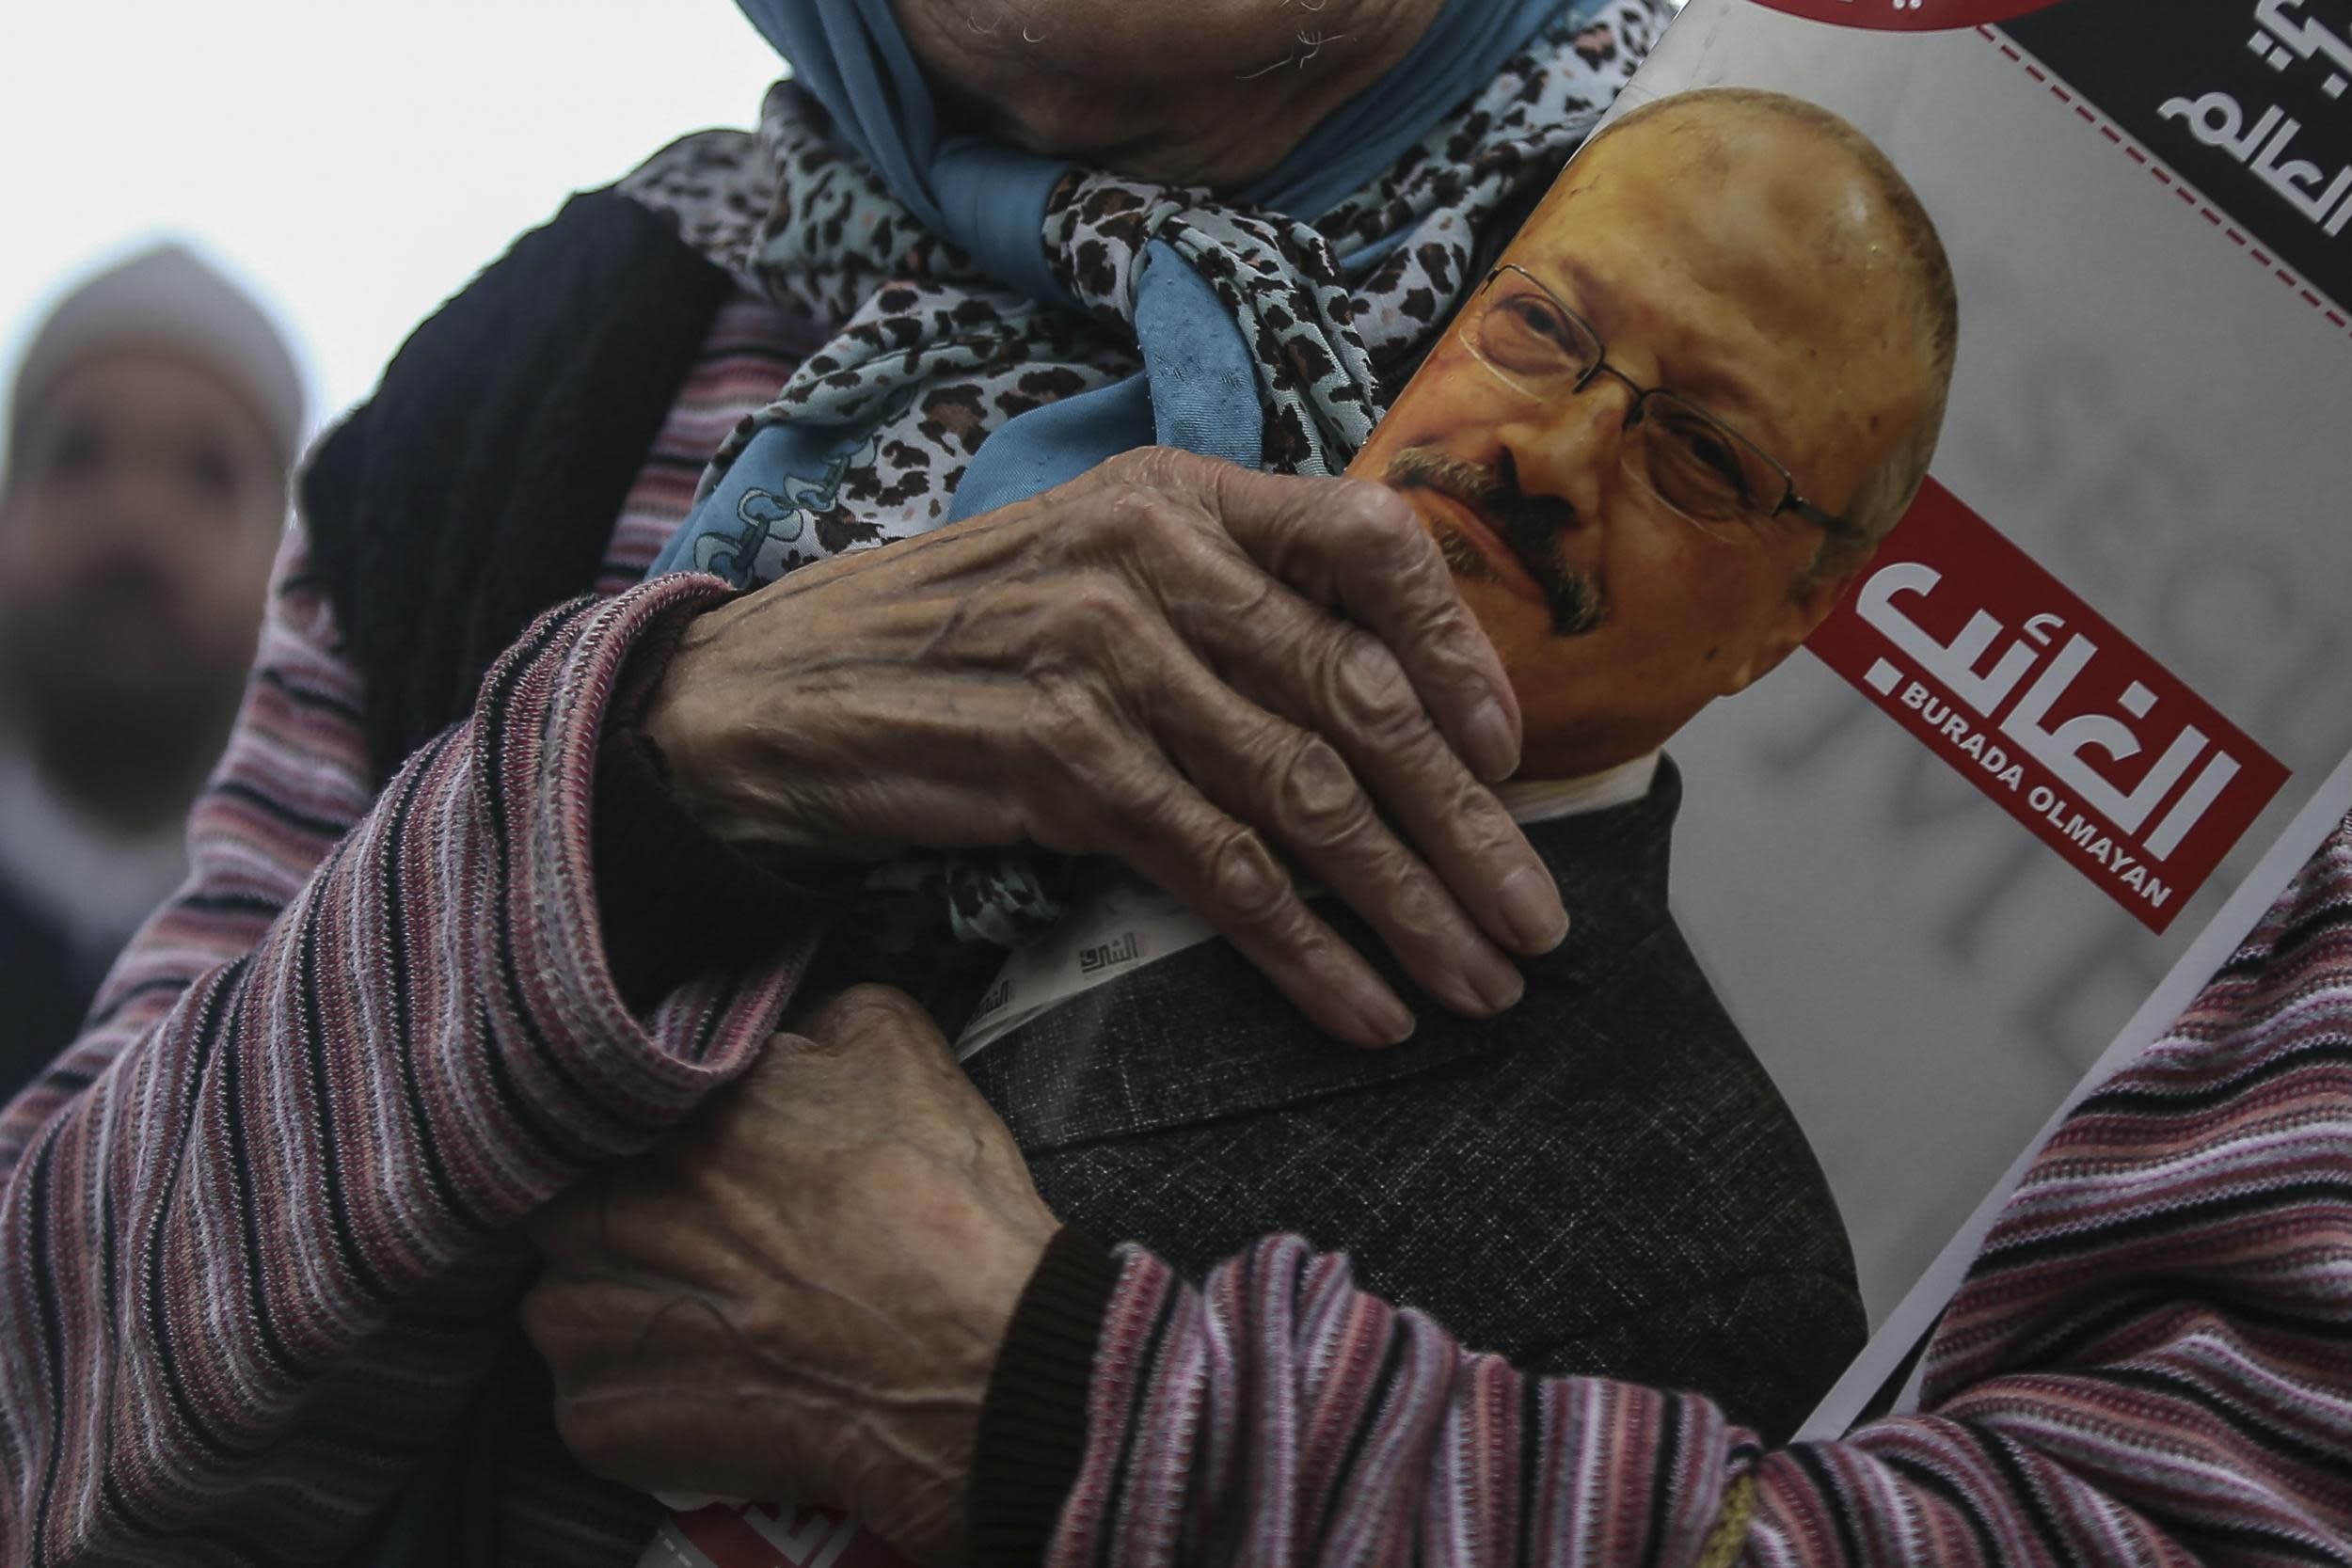 Trump suggests 'vicious world' should be blamed for Khashoggi murder while disputing Saudi responsibility